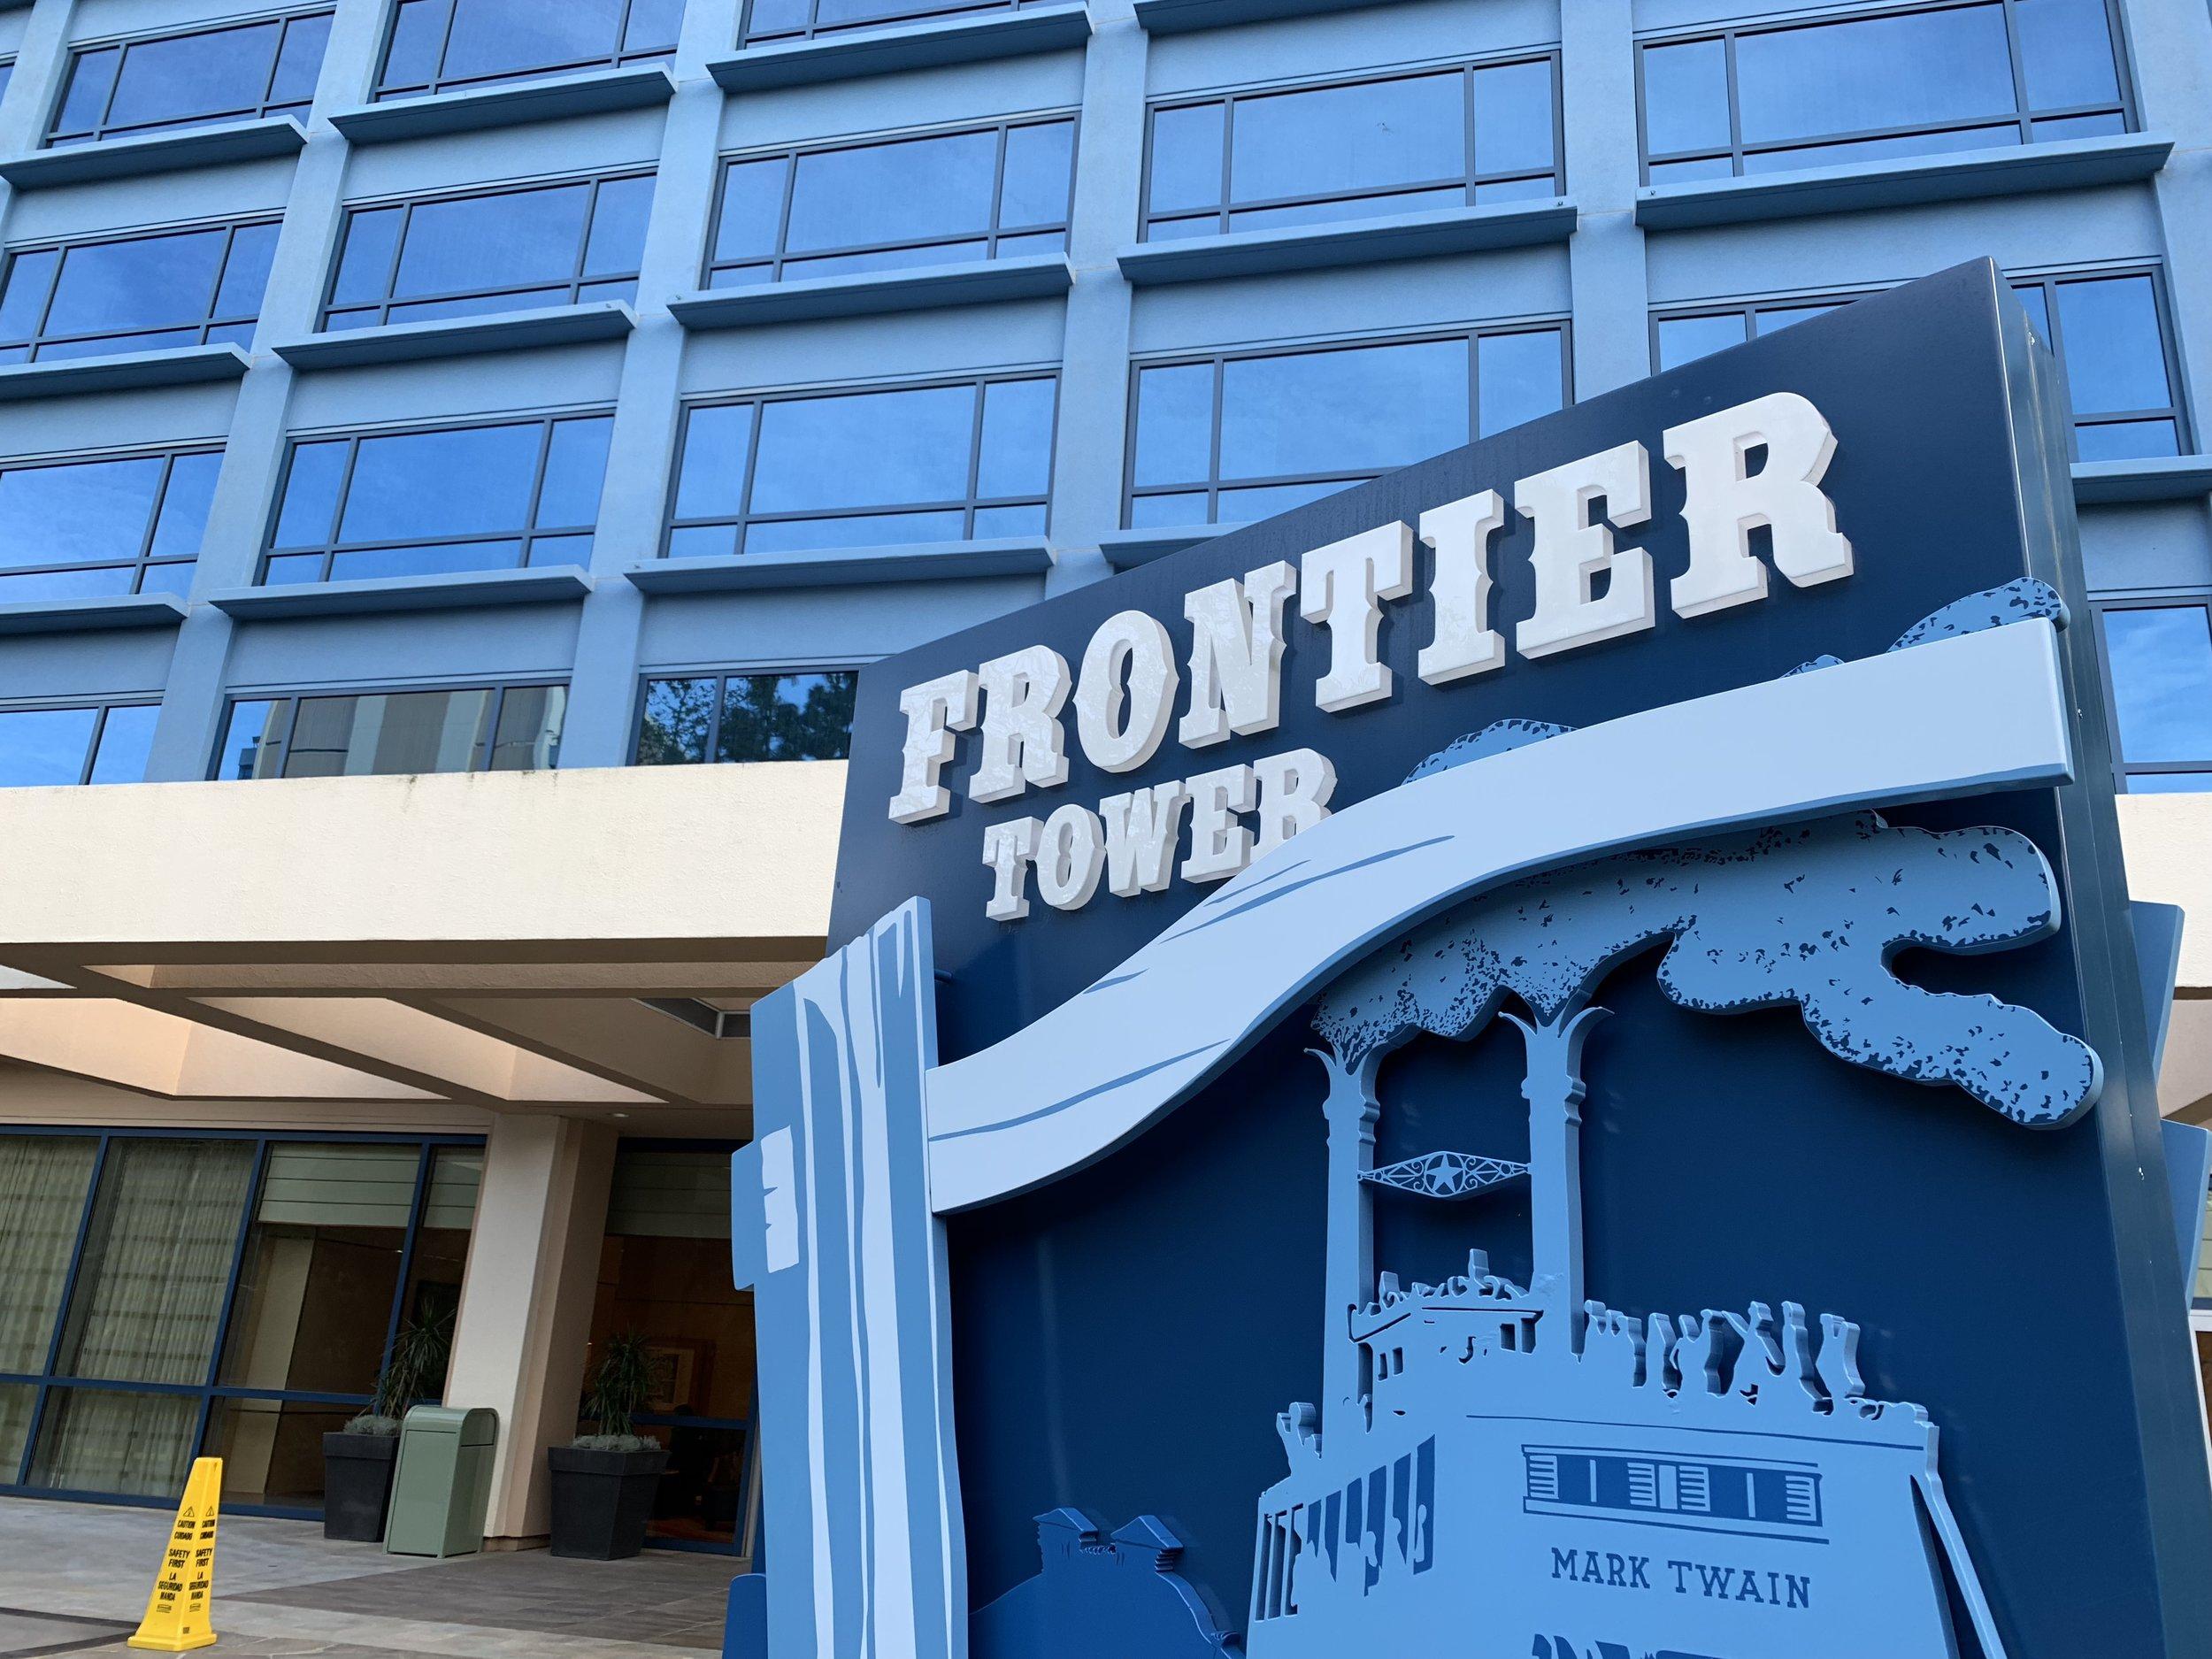 disneyland trip report day 1 frontier tower 1.jpeg